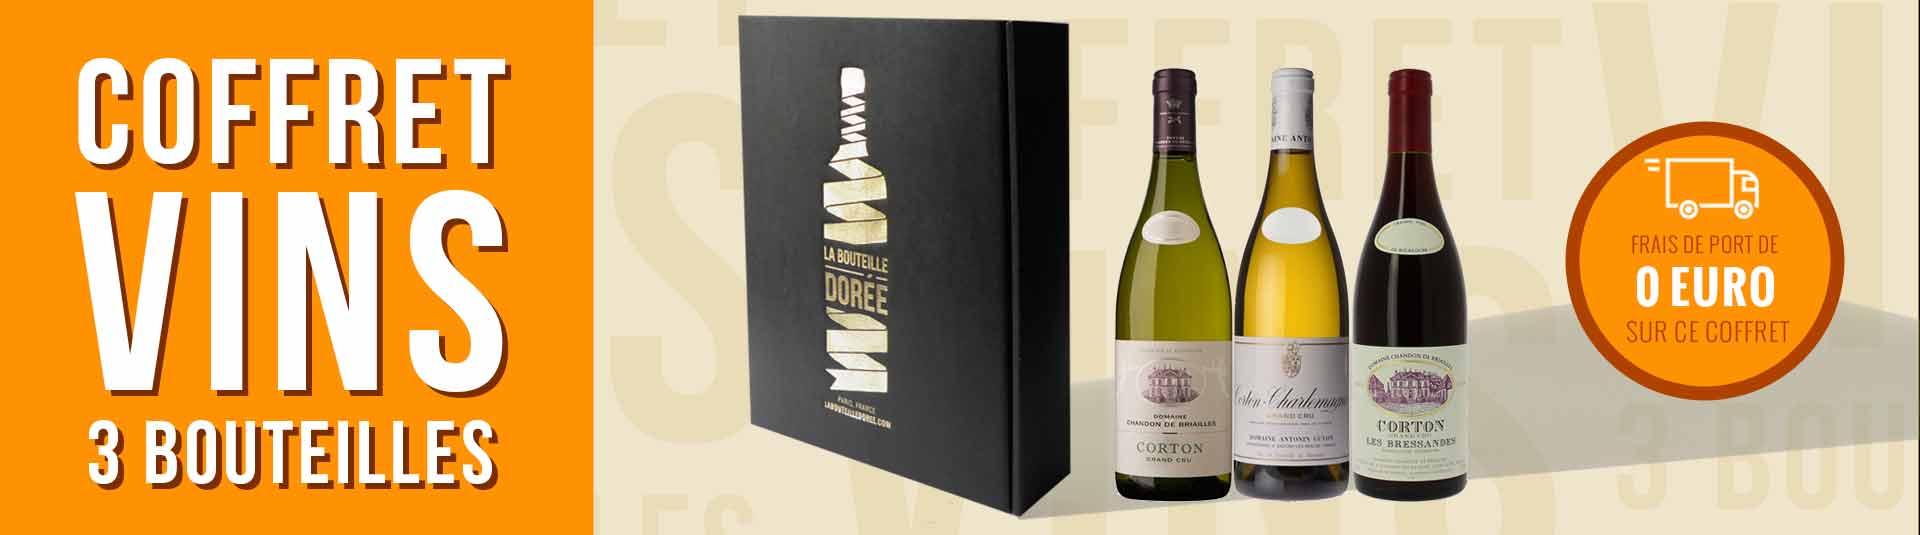 Coffret vin Prestige 3 bouteilles Bourgogne Corton